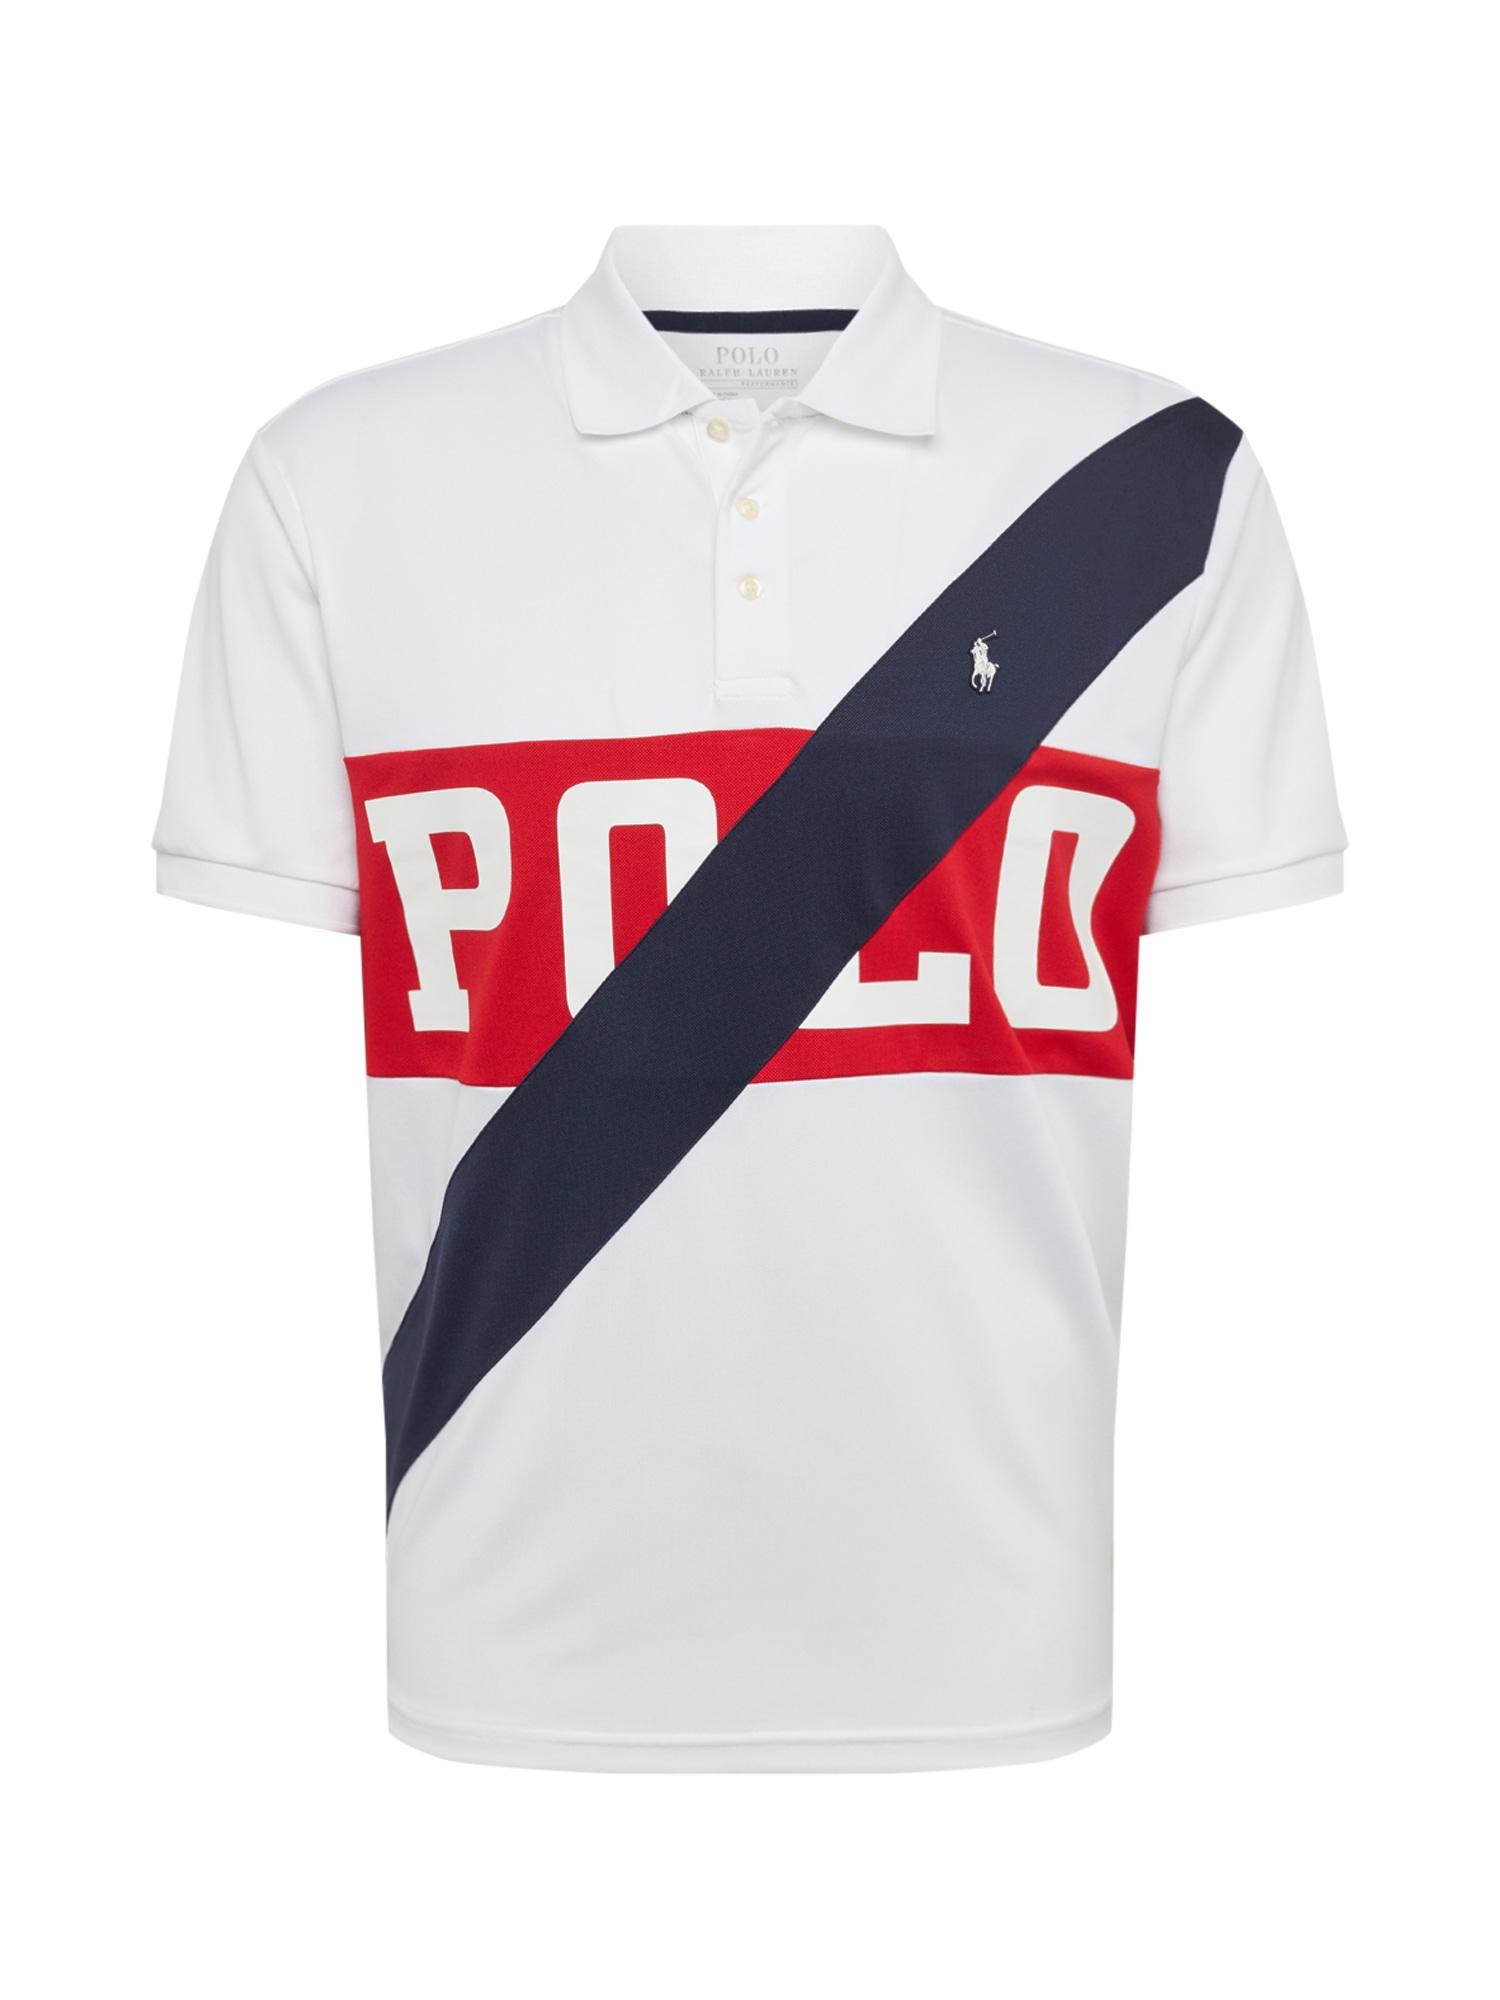 Tričko tmavě modrá červená bílá POLO RALPH LAUREN